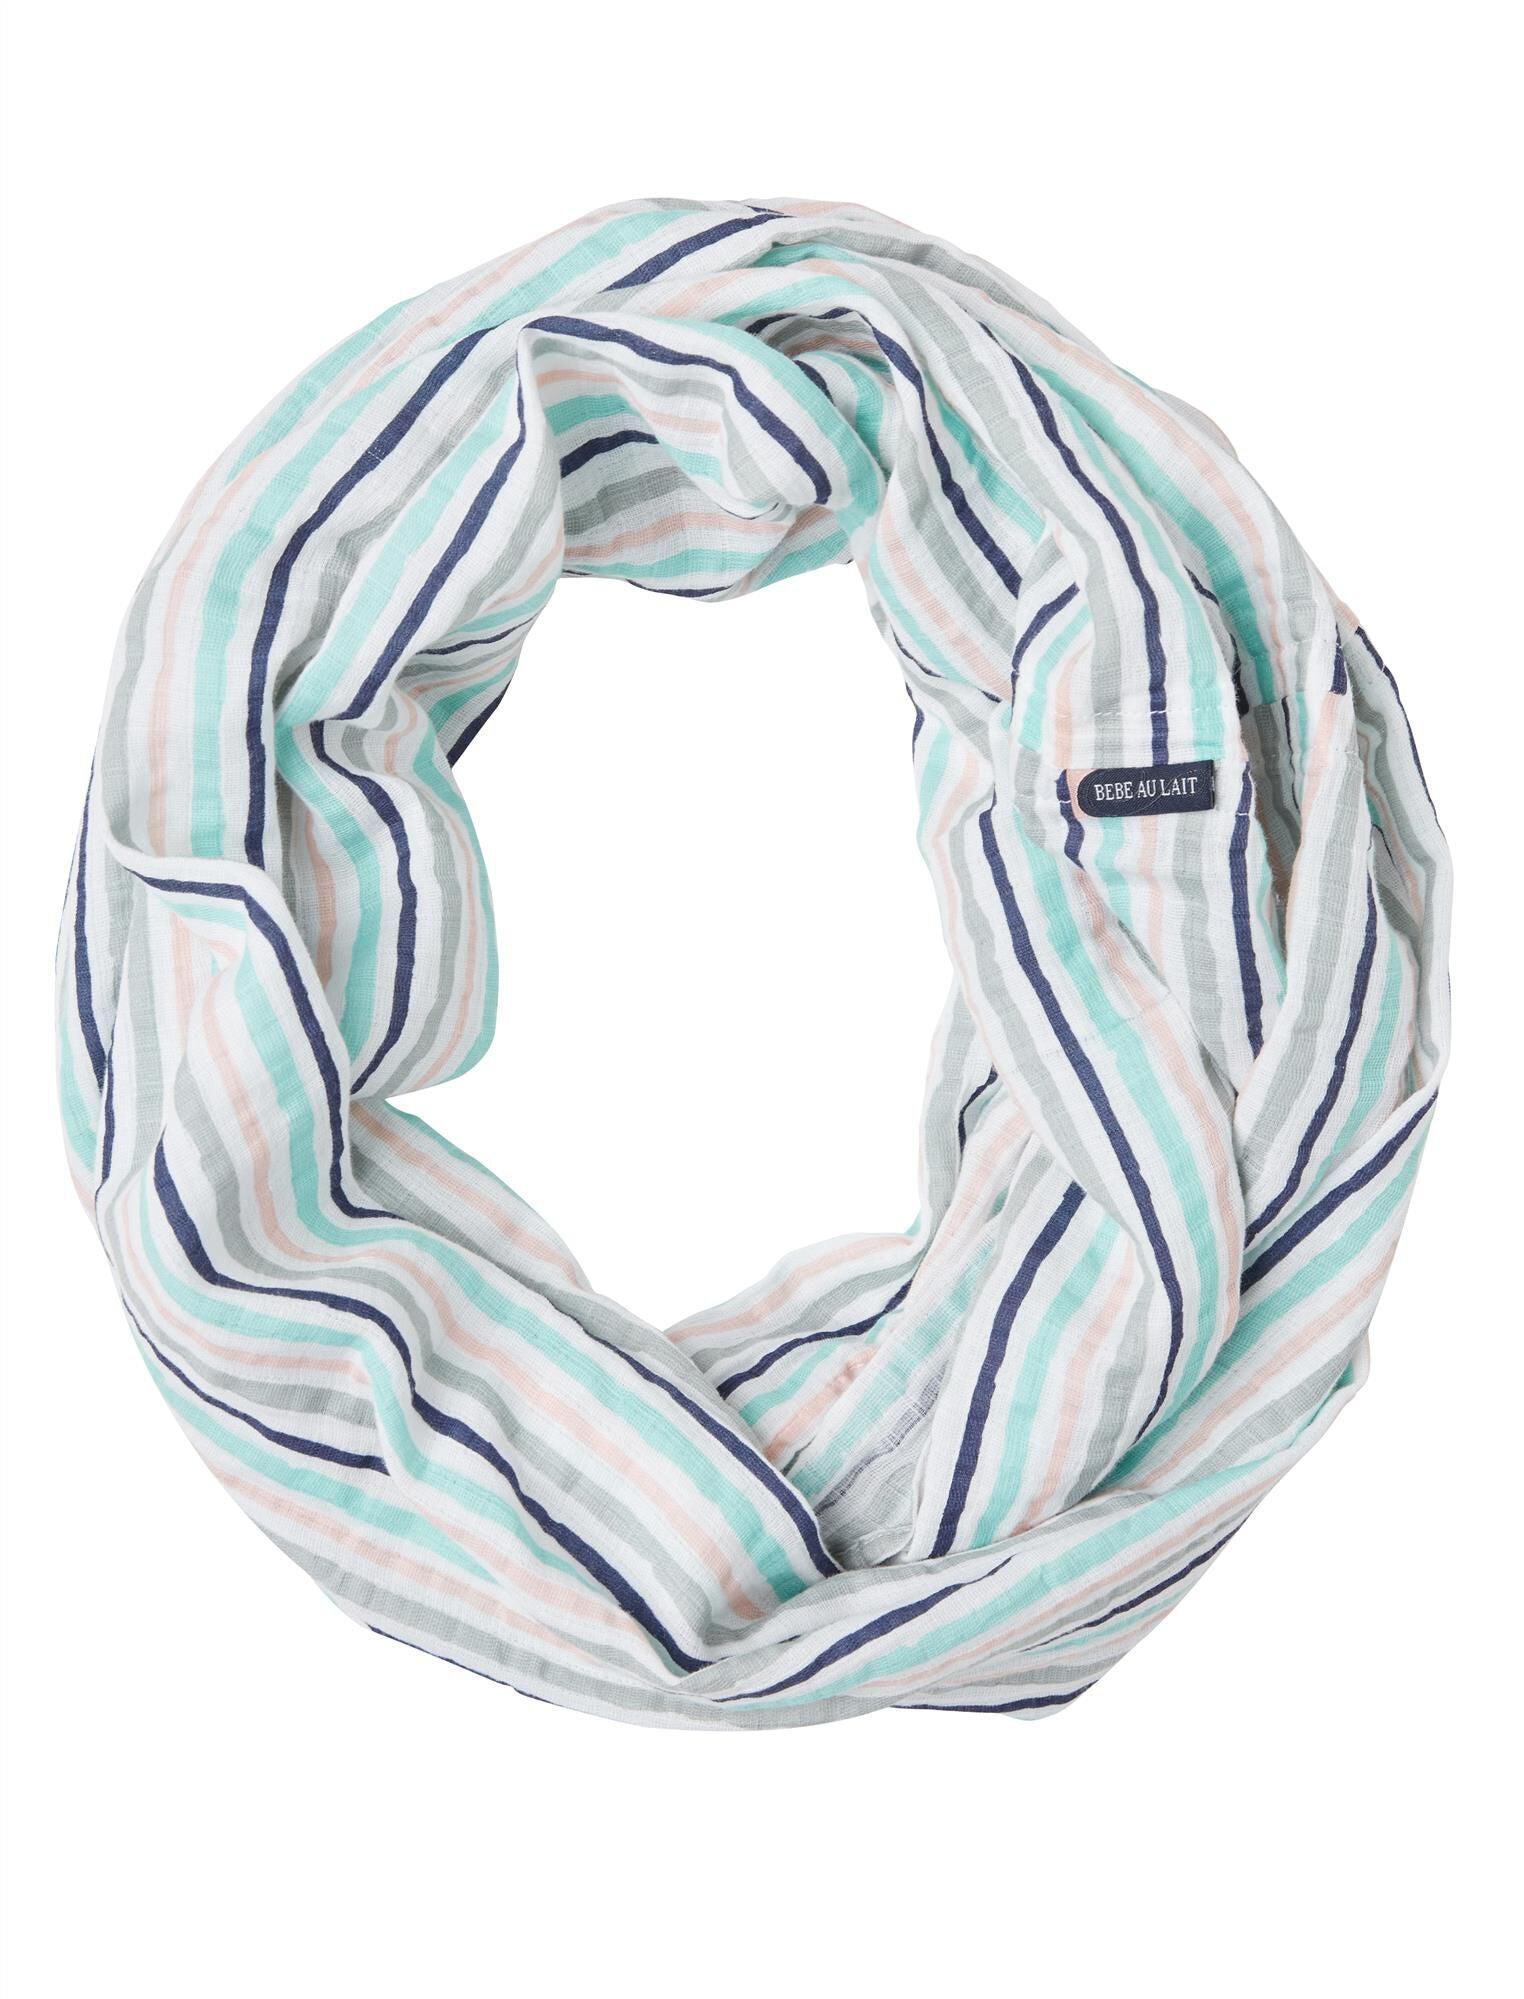 Motherhood Maternity Bebe au Lait Muslin Infinity Breastfeeding Scarf- Candy Stripe in   (Size: )